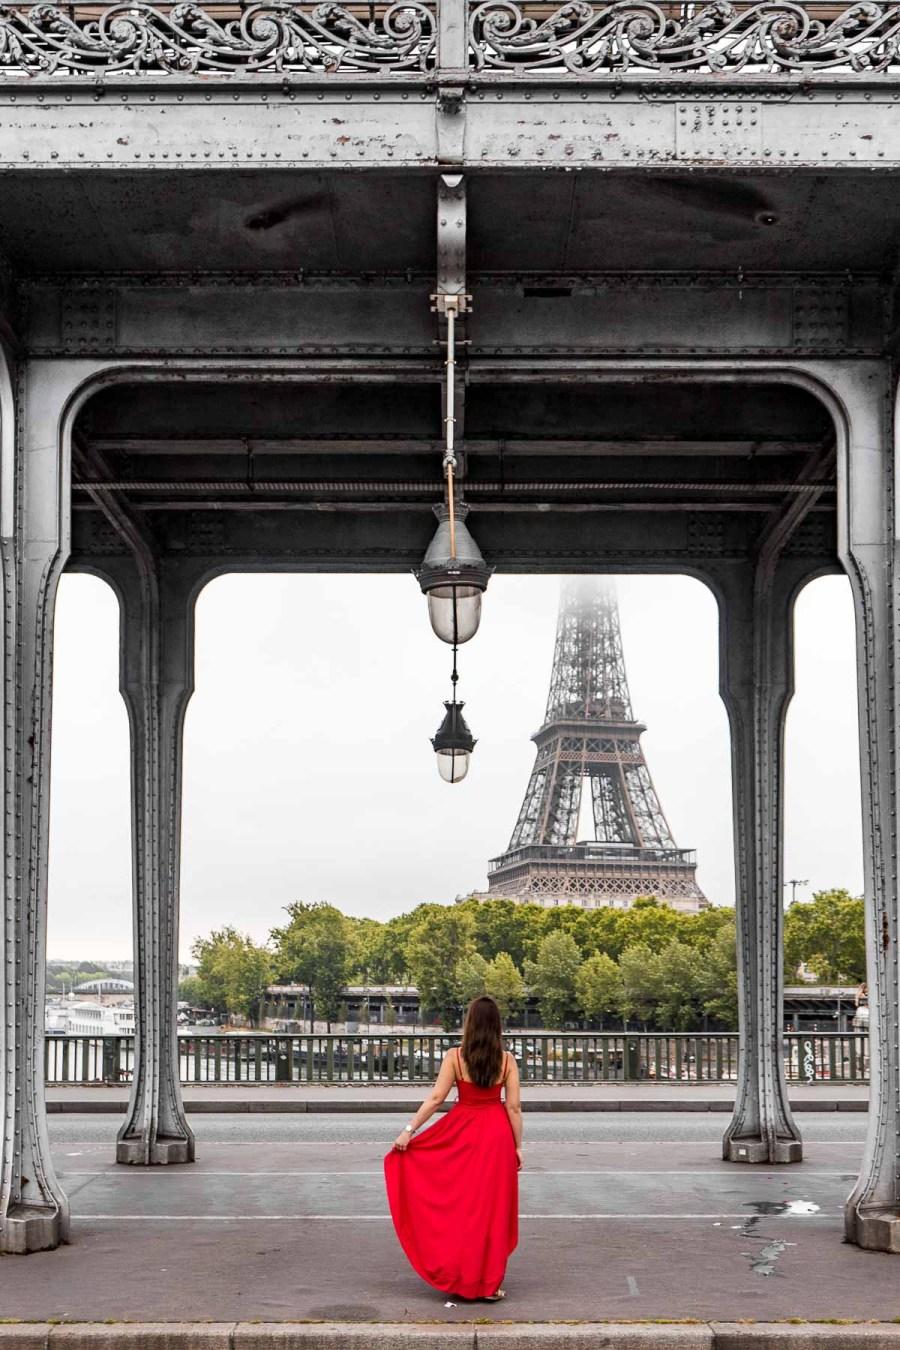 Girl in a red dress standing under Pont de bir-Hakeim, looking at the Eiffel Tower